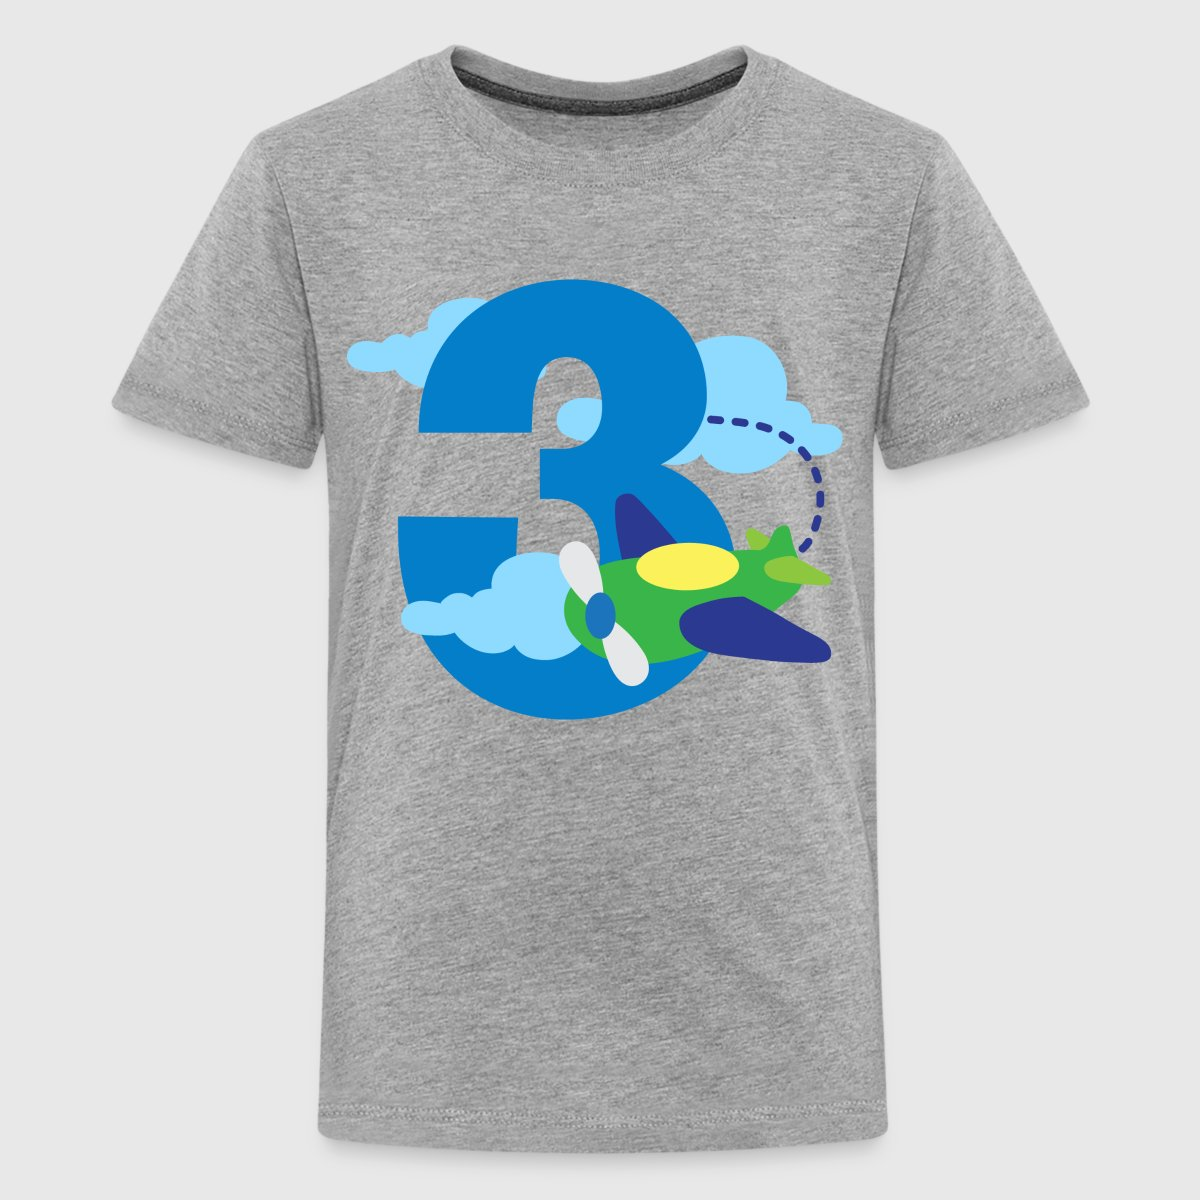 3rd Birthday Shirt Toddler Boy